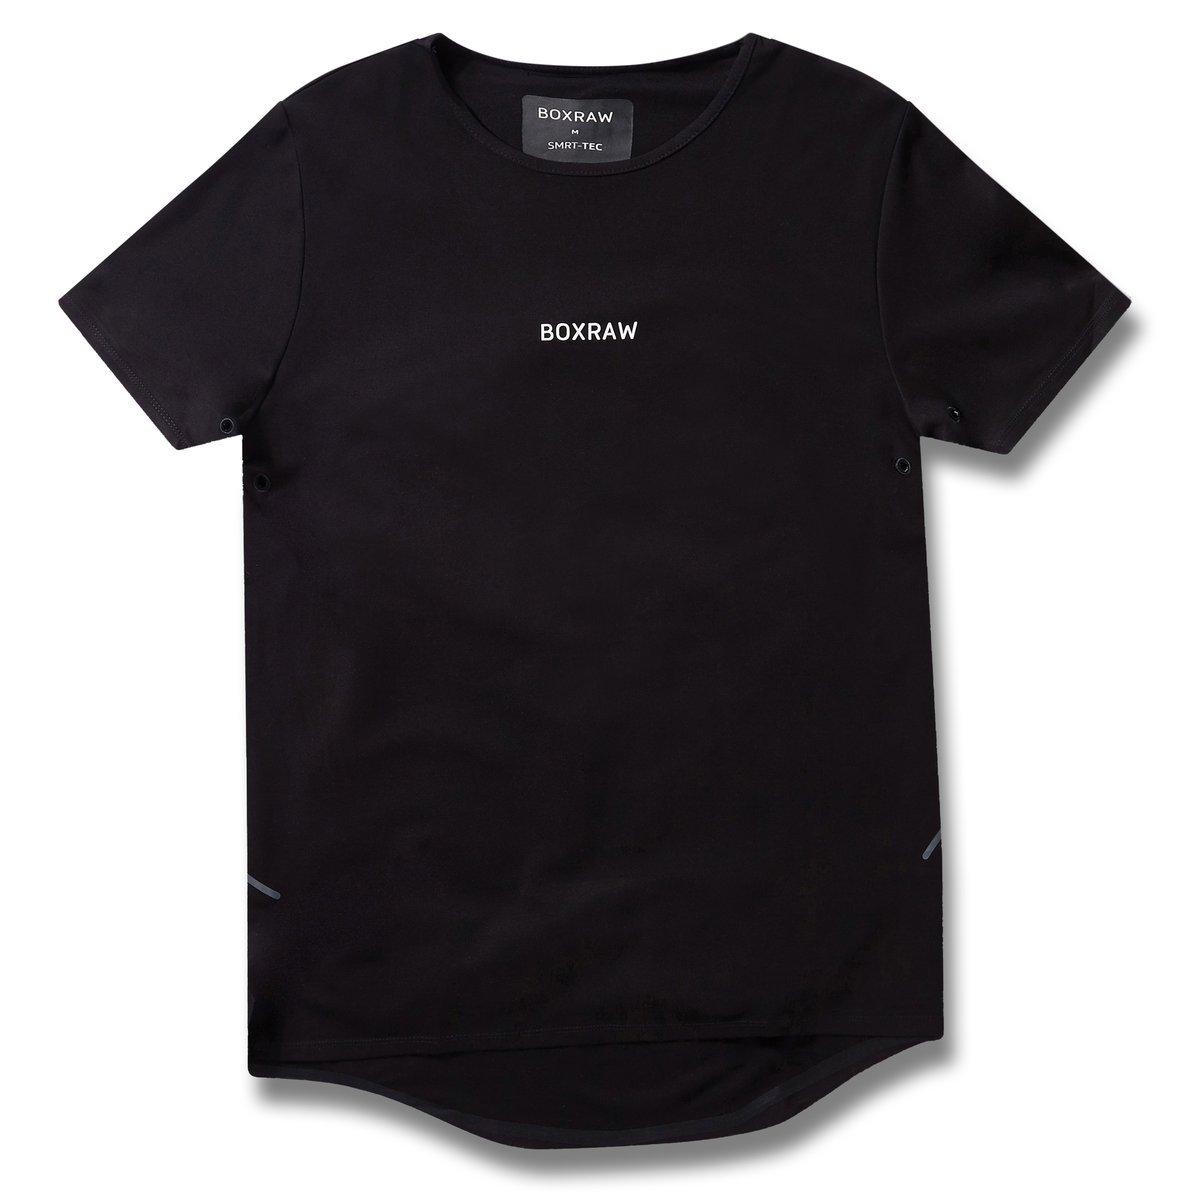 BOXRAW SMRT-TEC T-Shirt Schwarz